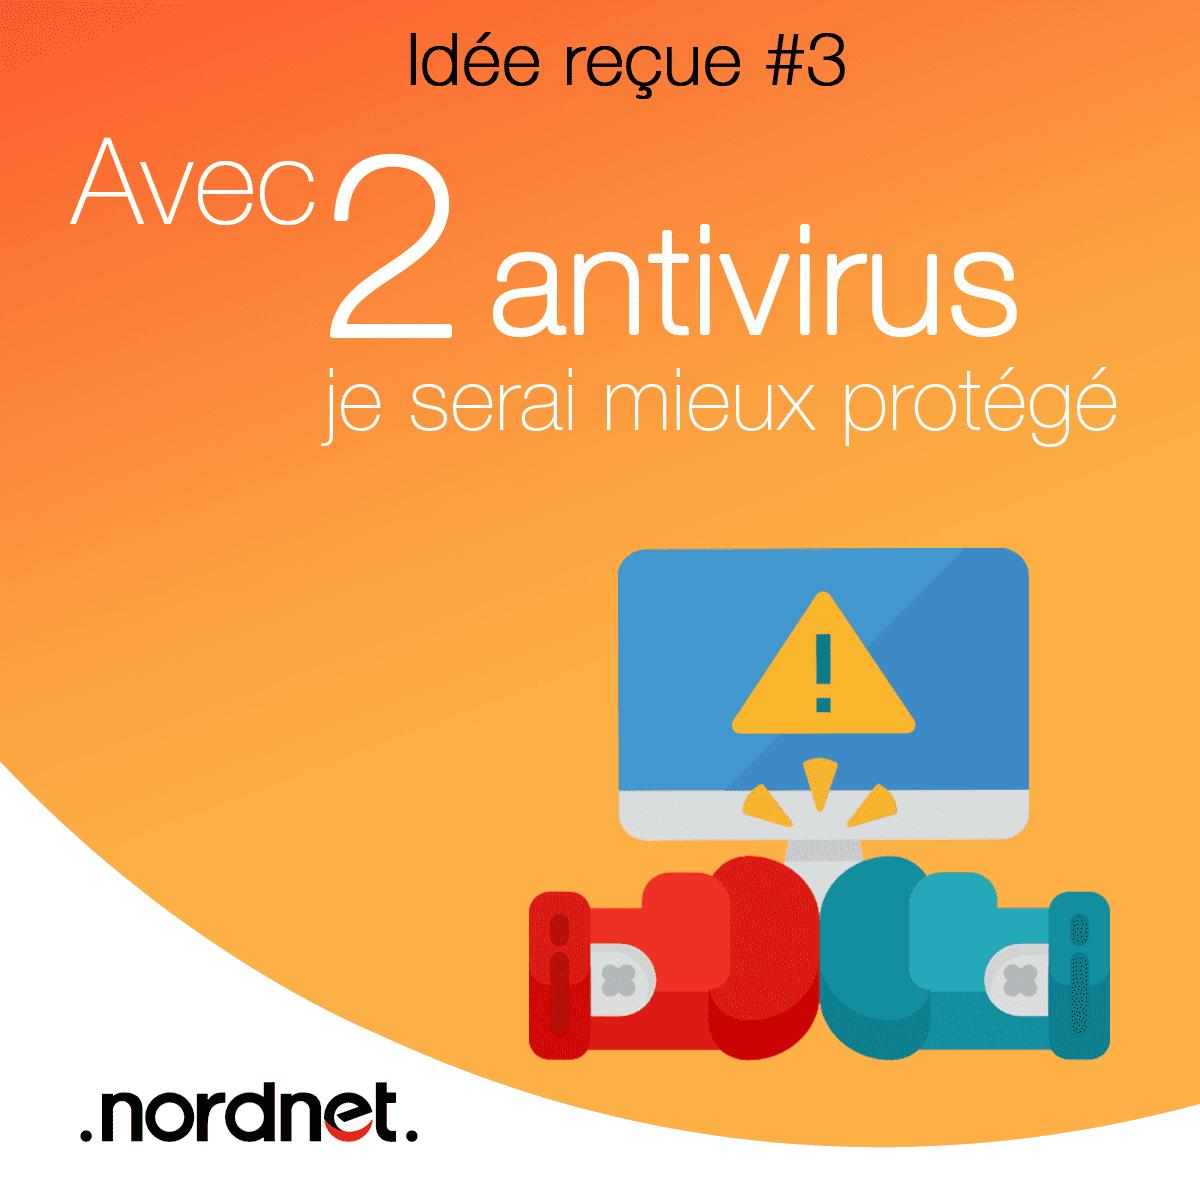 antivirus idée reçue